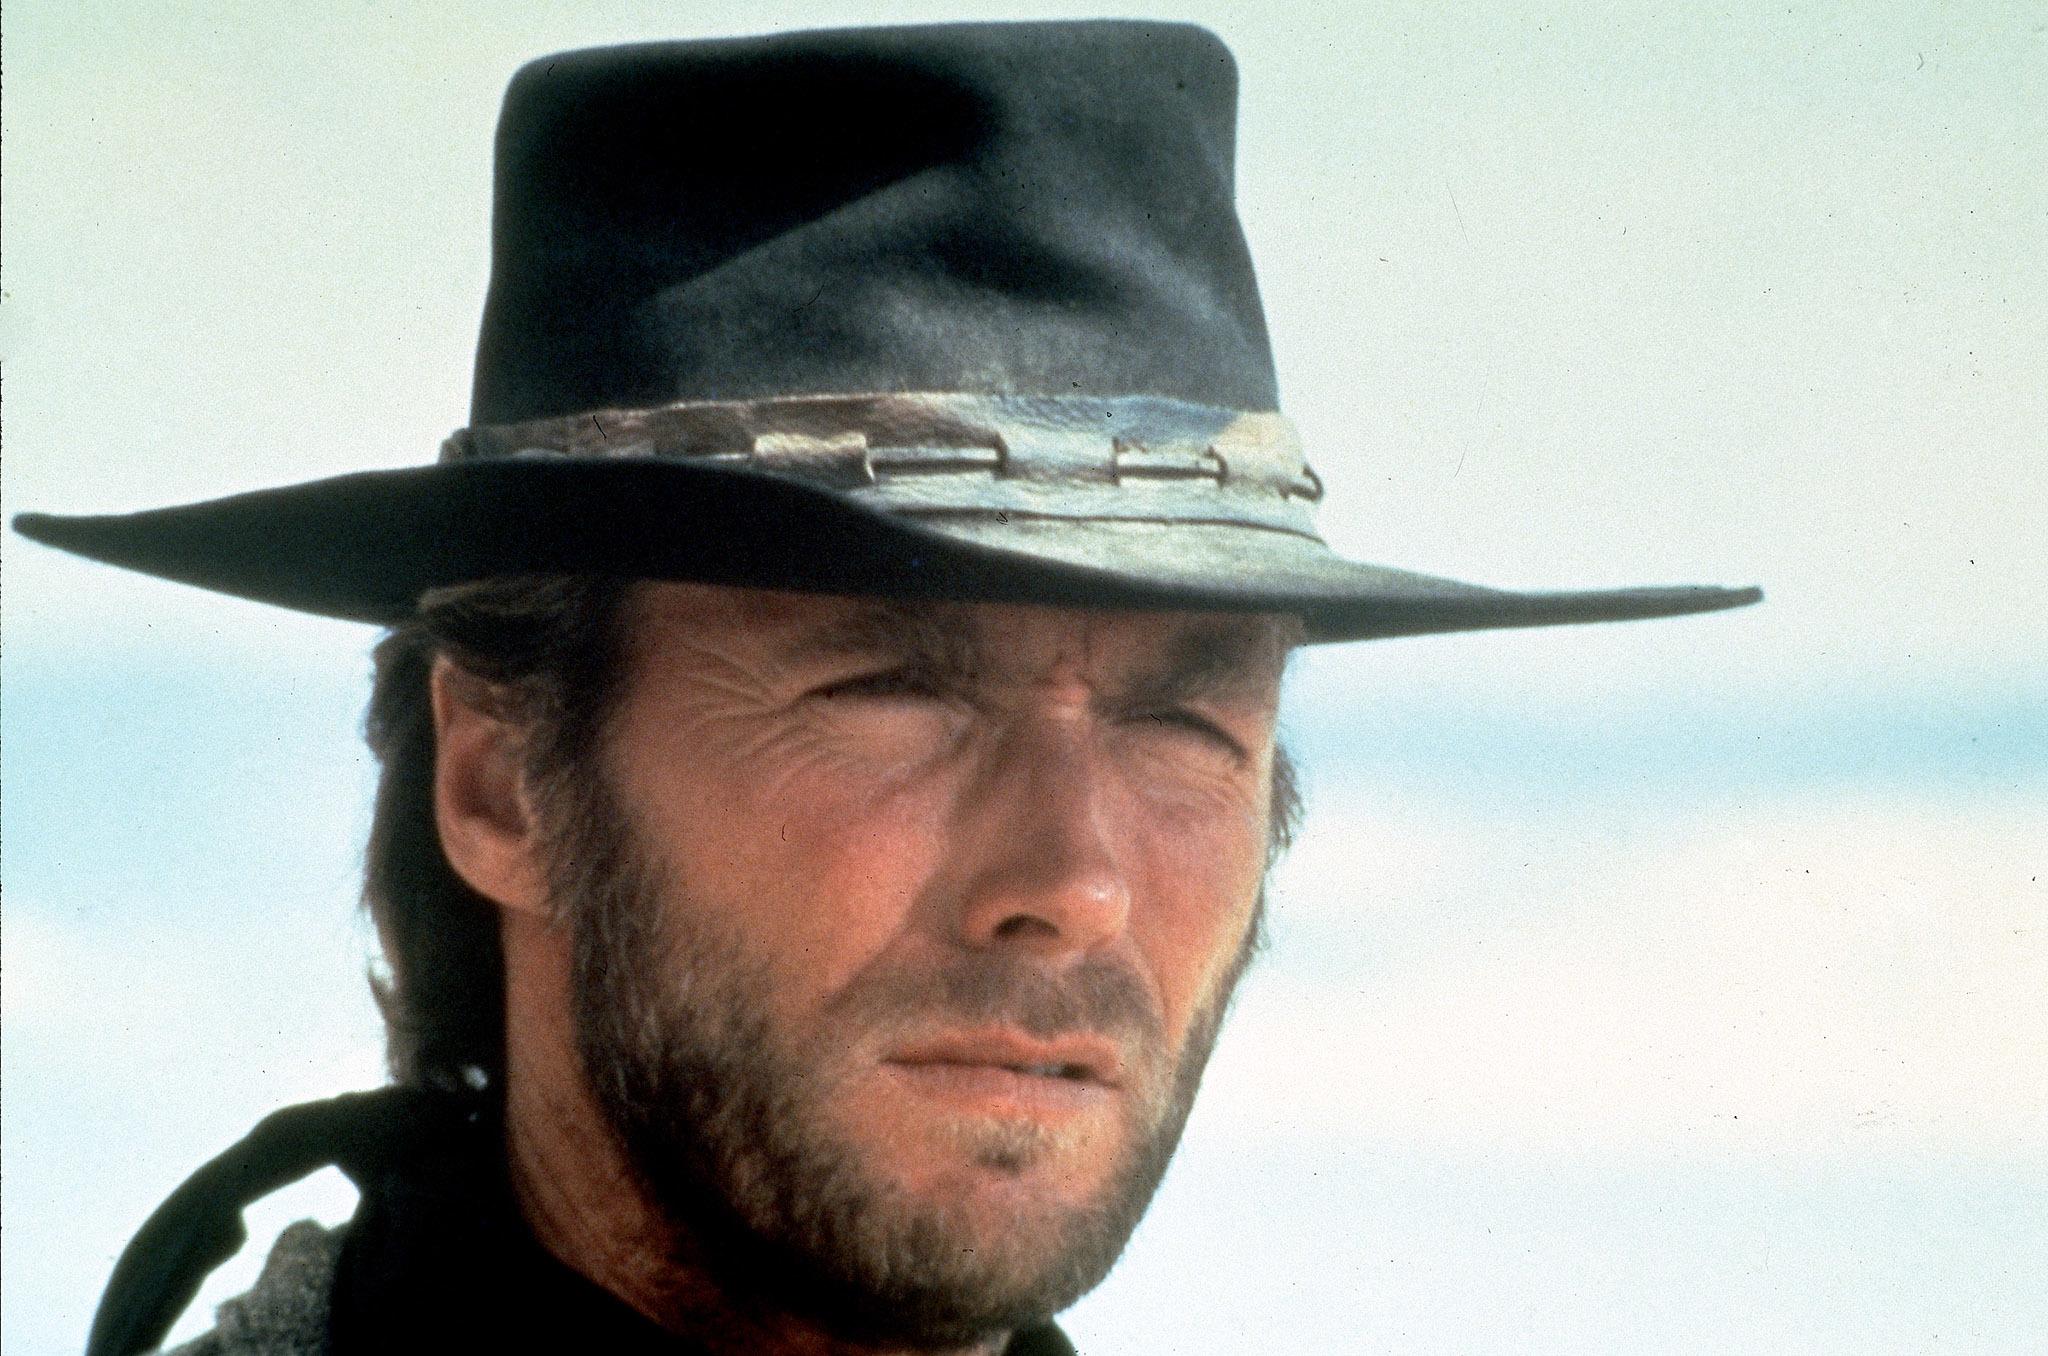 The 50 greatest westerns, best western movies, High Plains Drifter